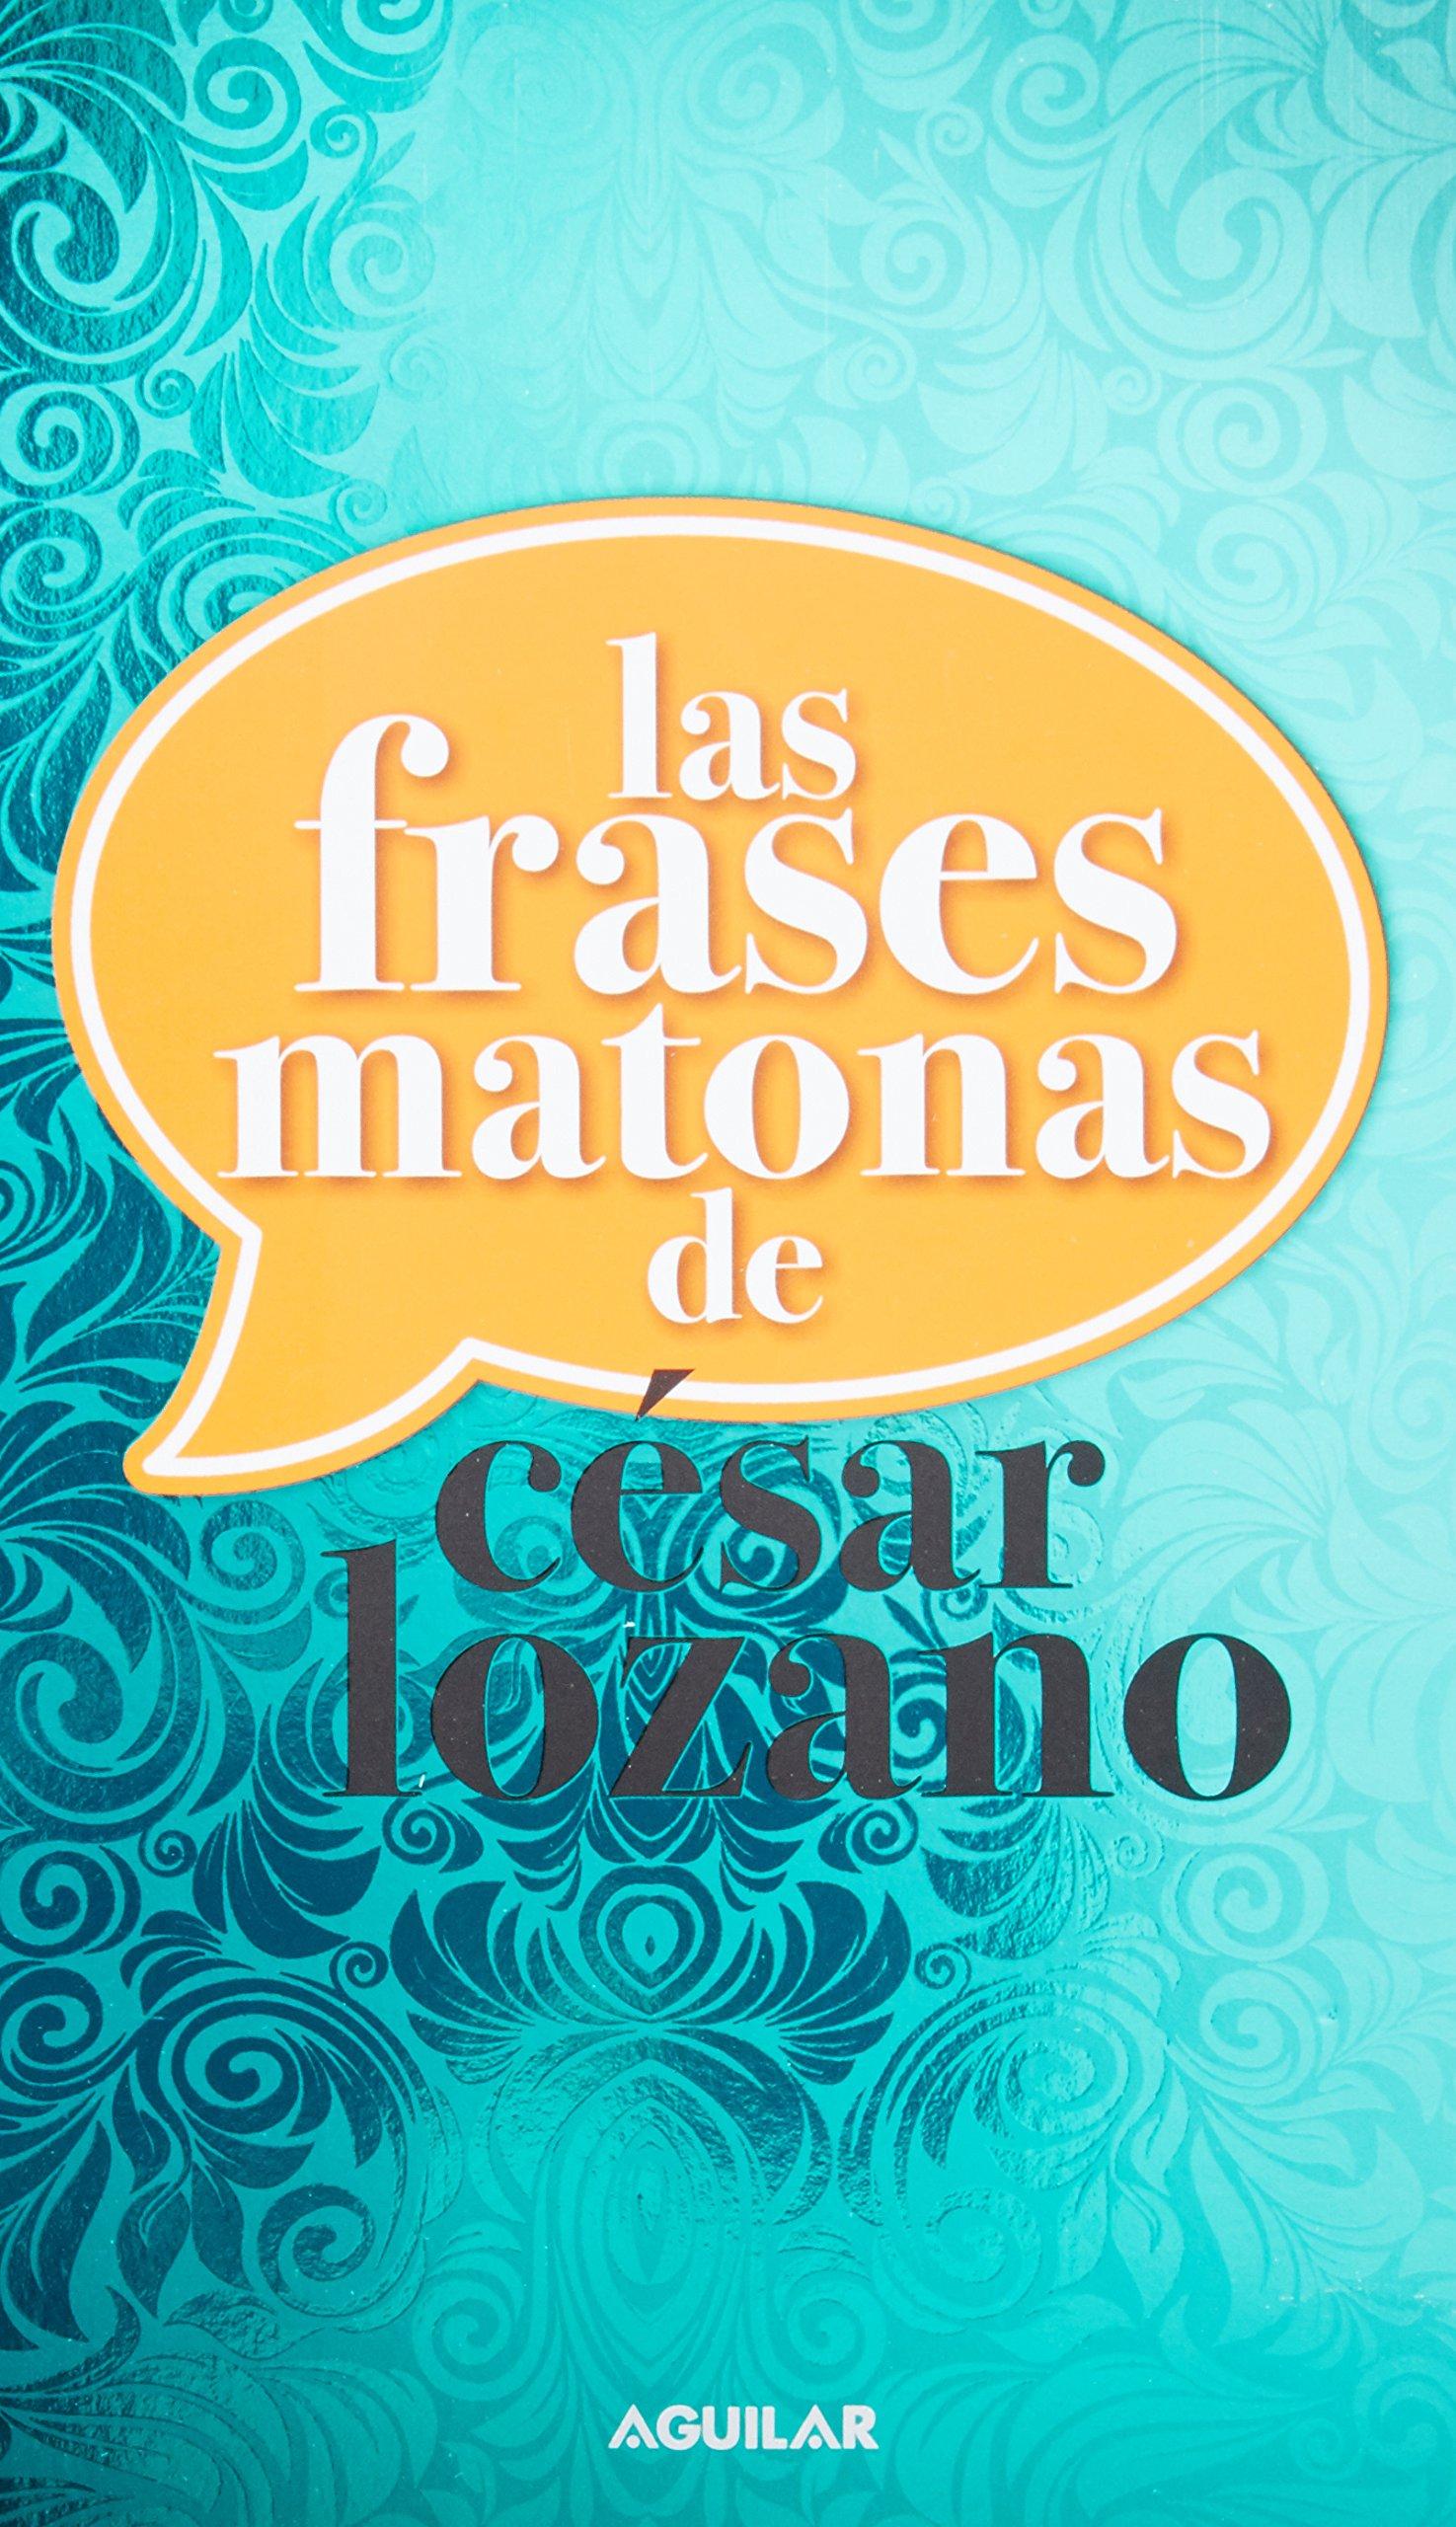 Las frases matonas de César Lozano (Spanish Edition)